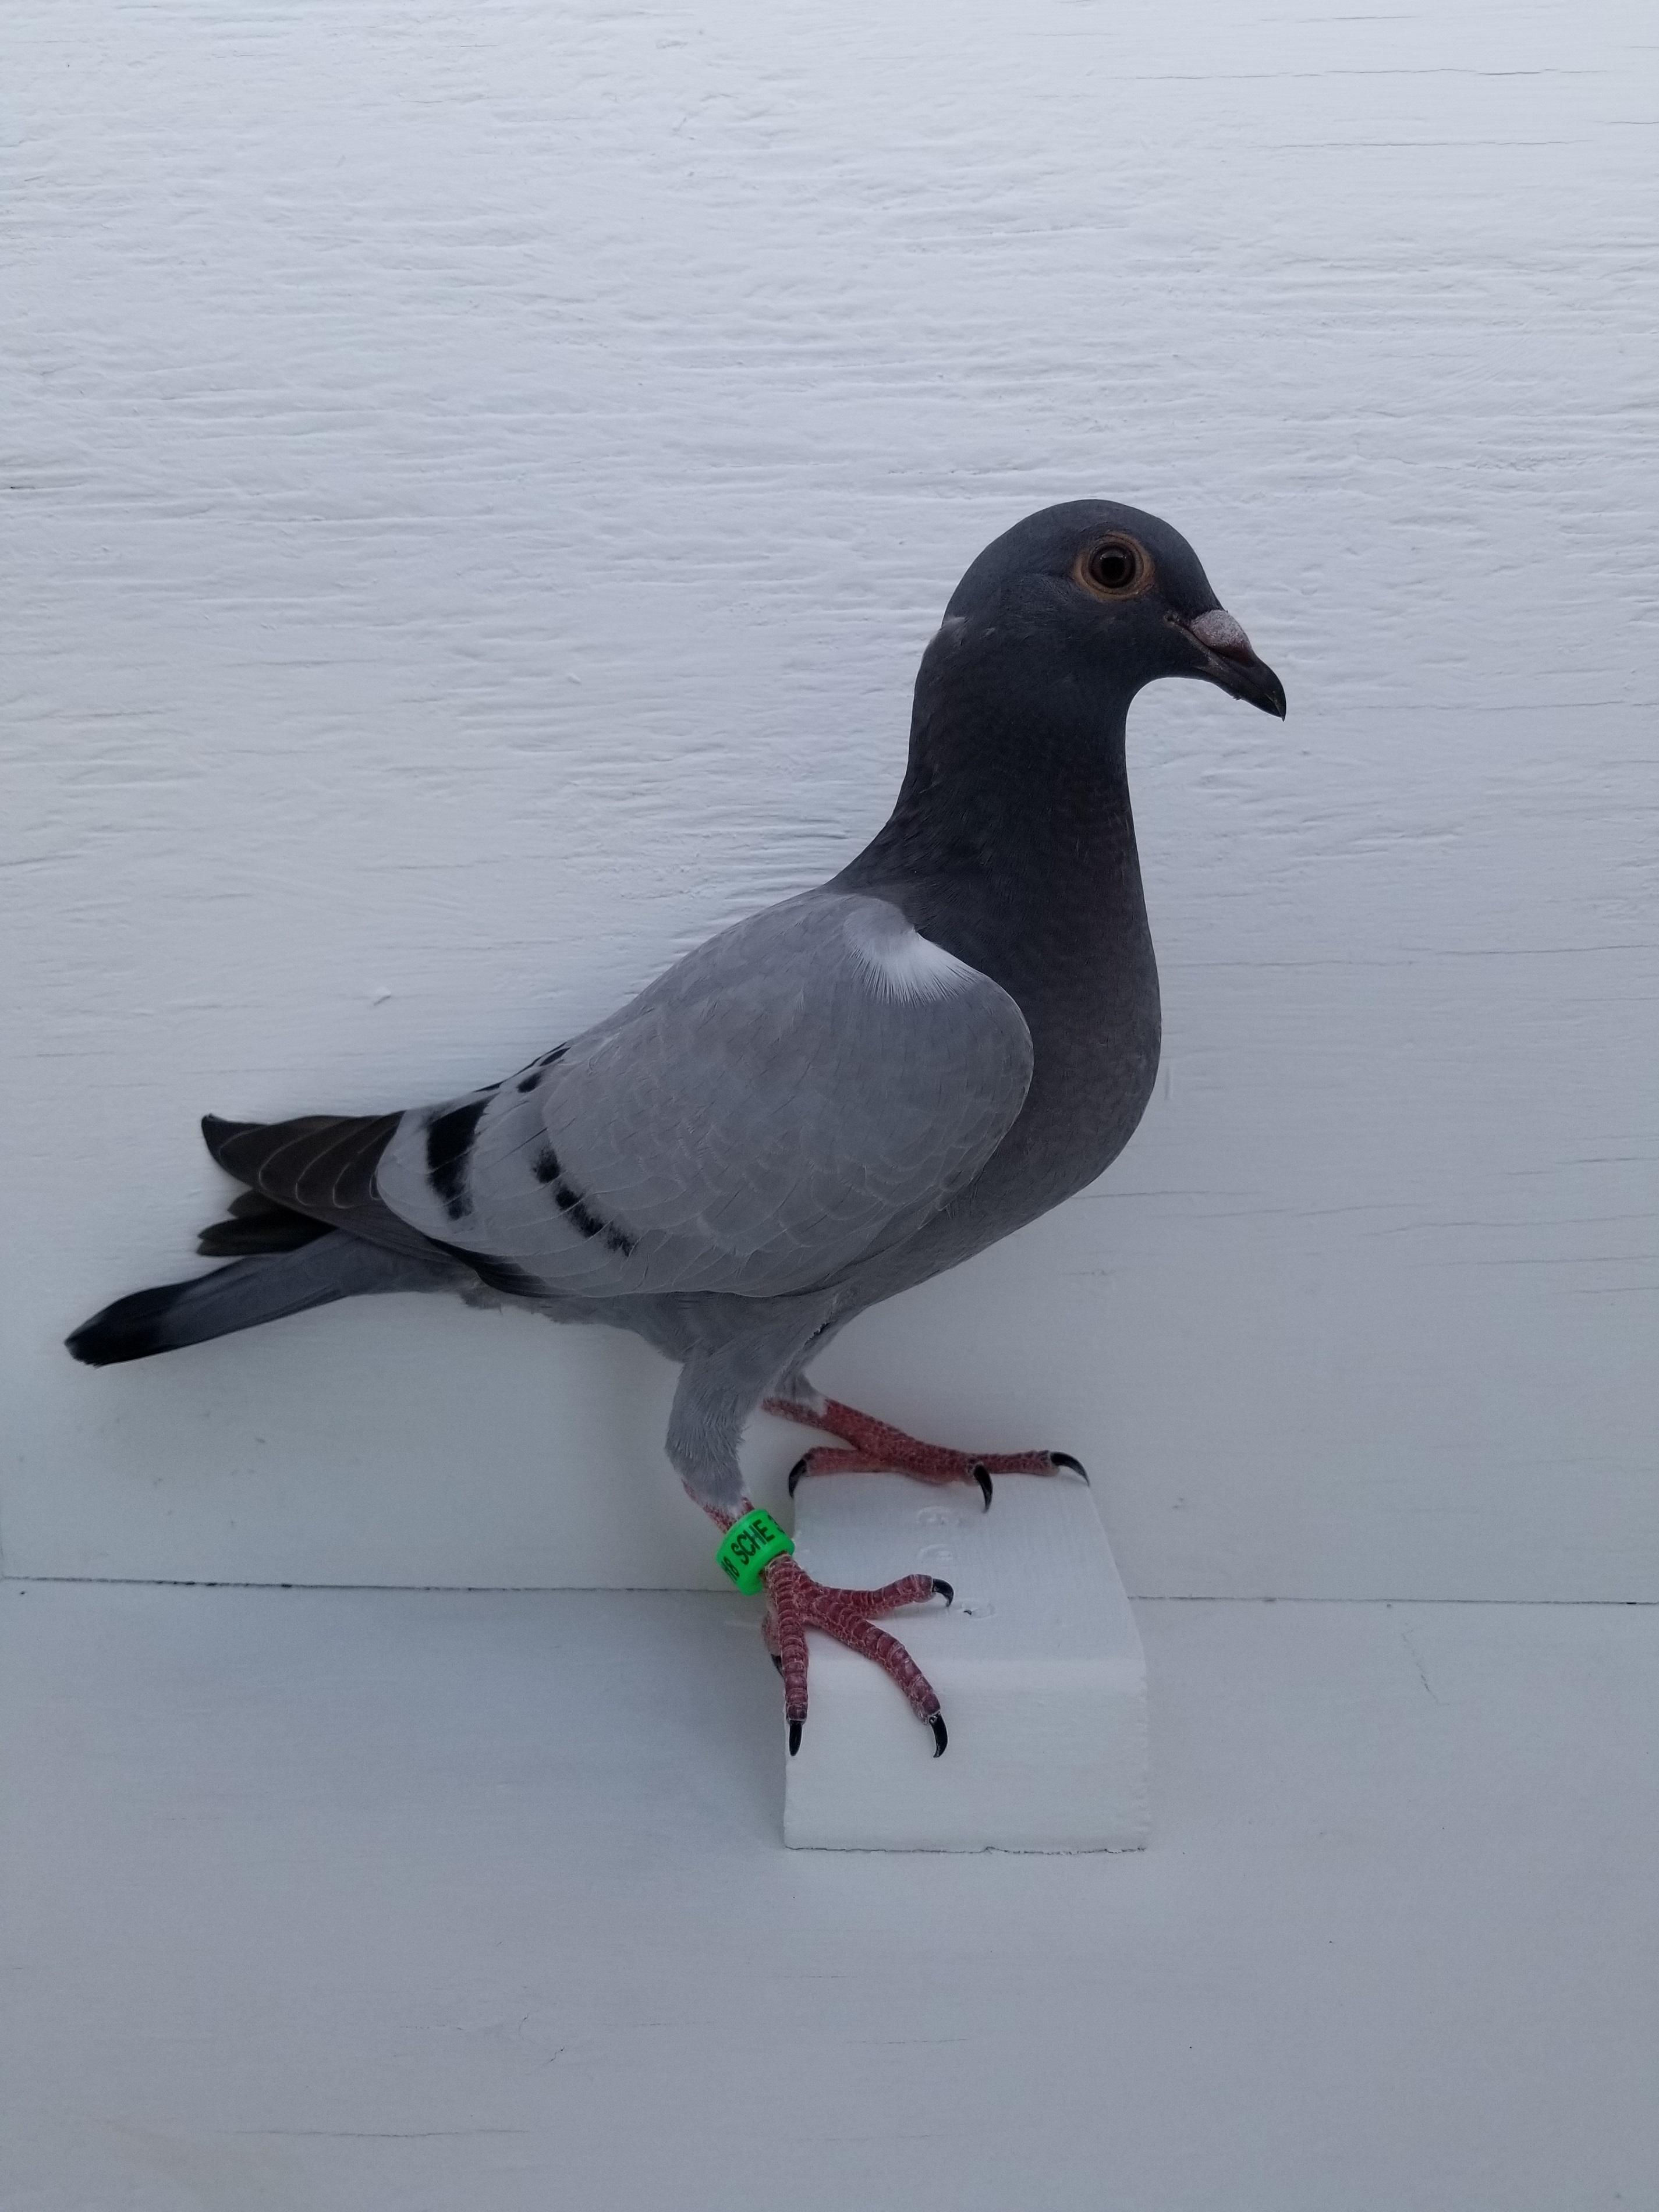 SPEED BIRD, ALL DISTANCES